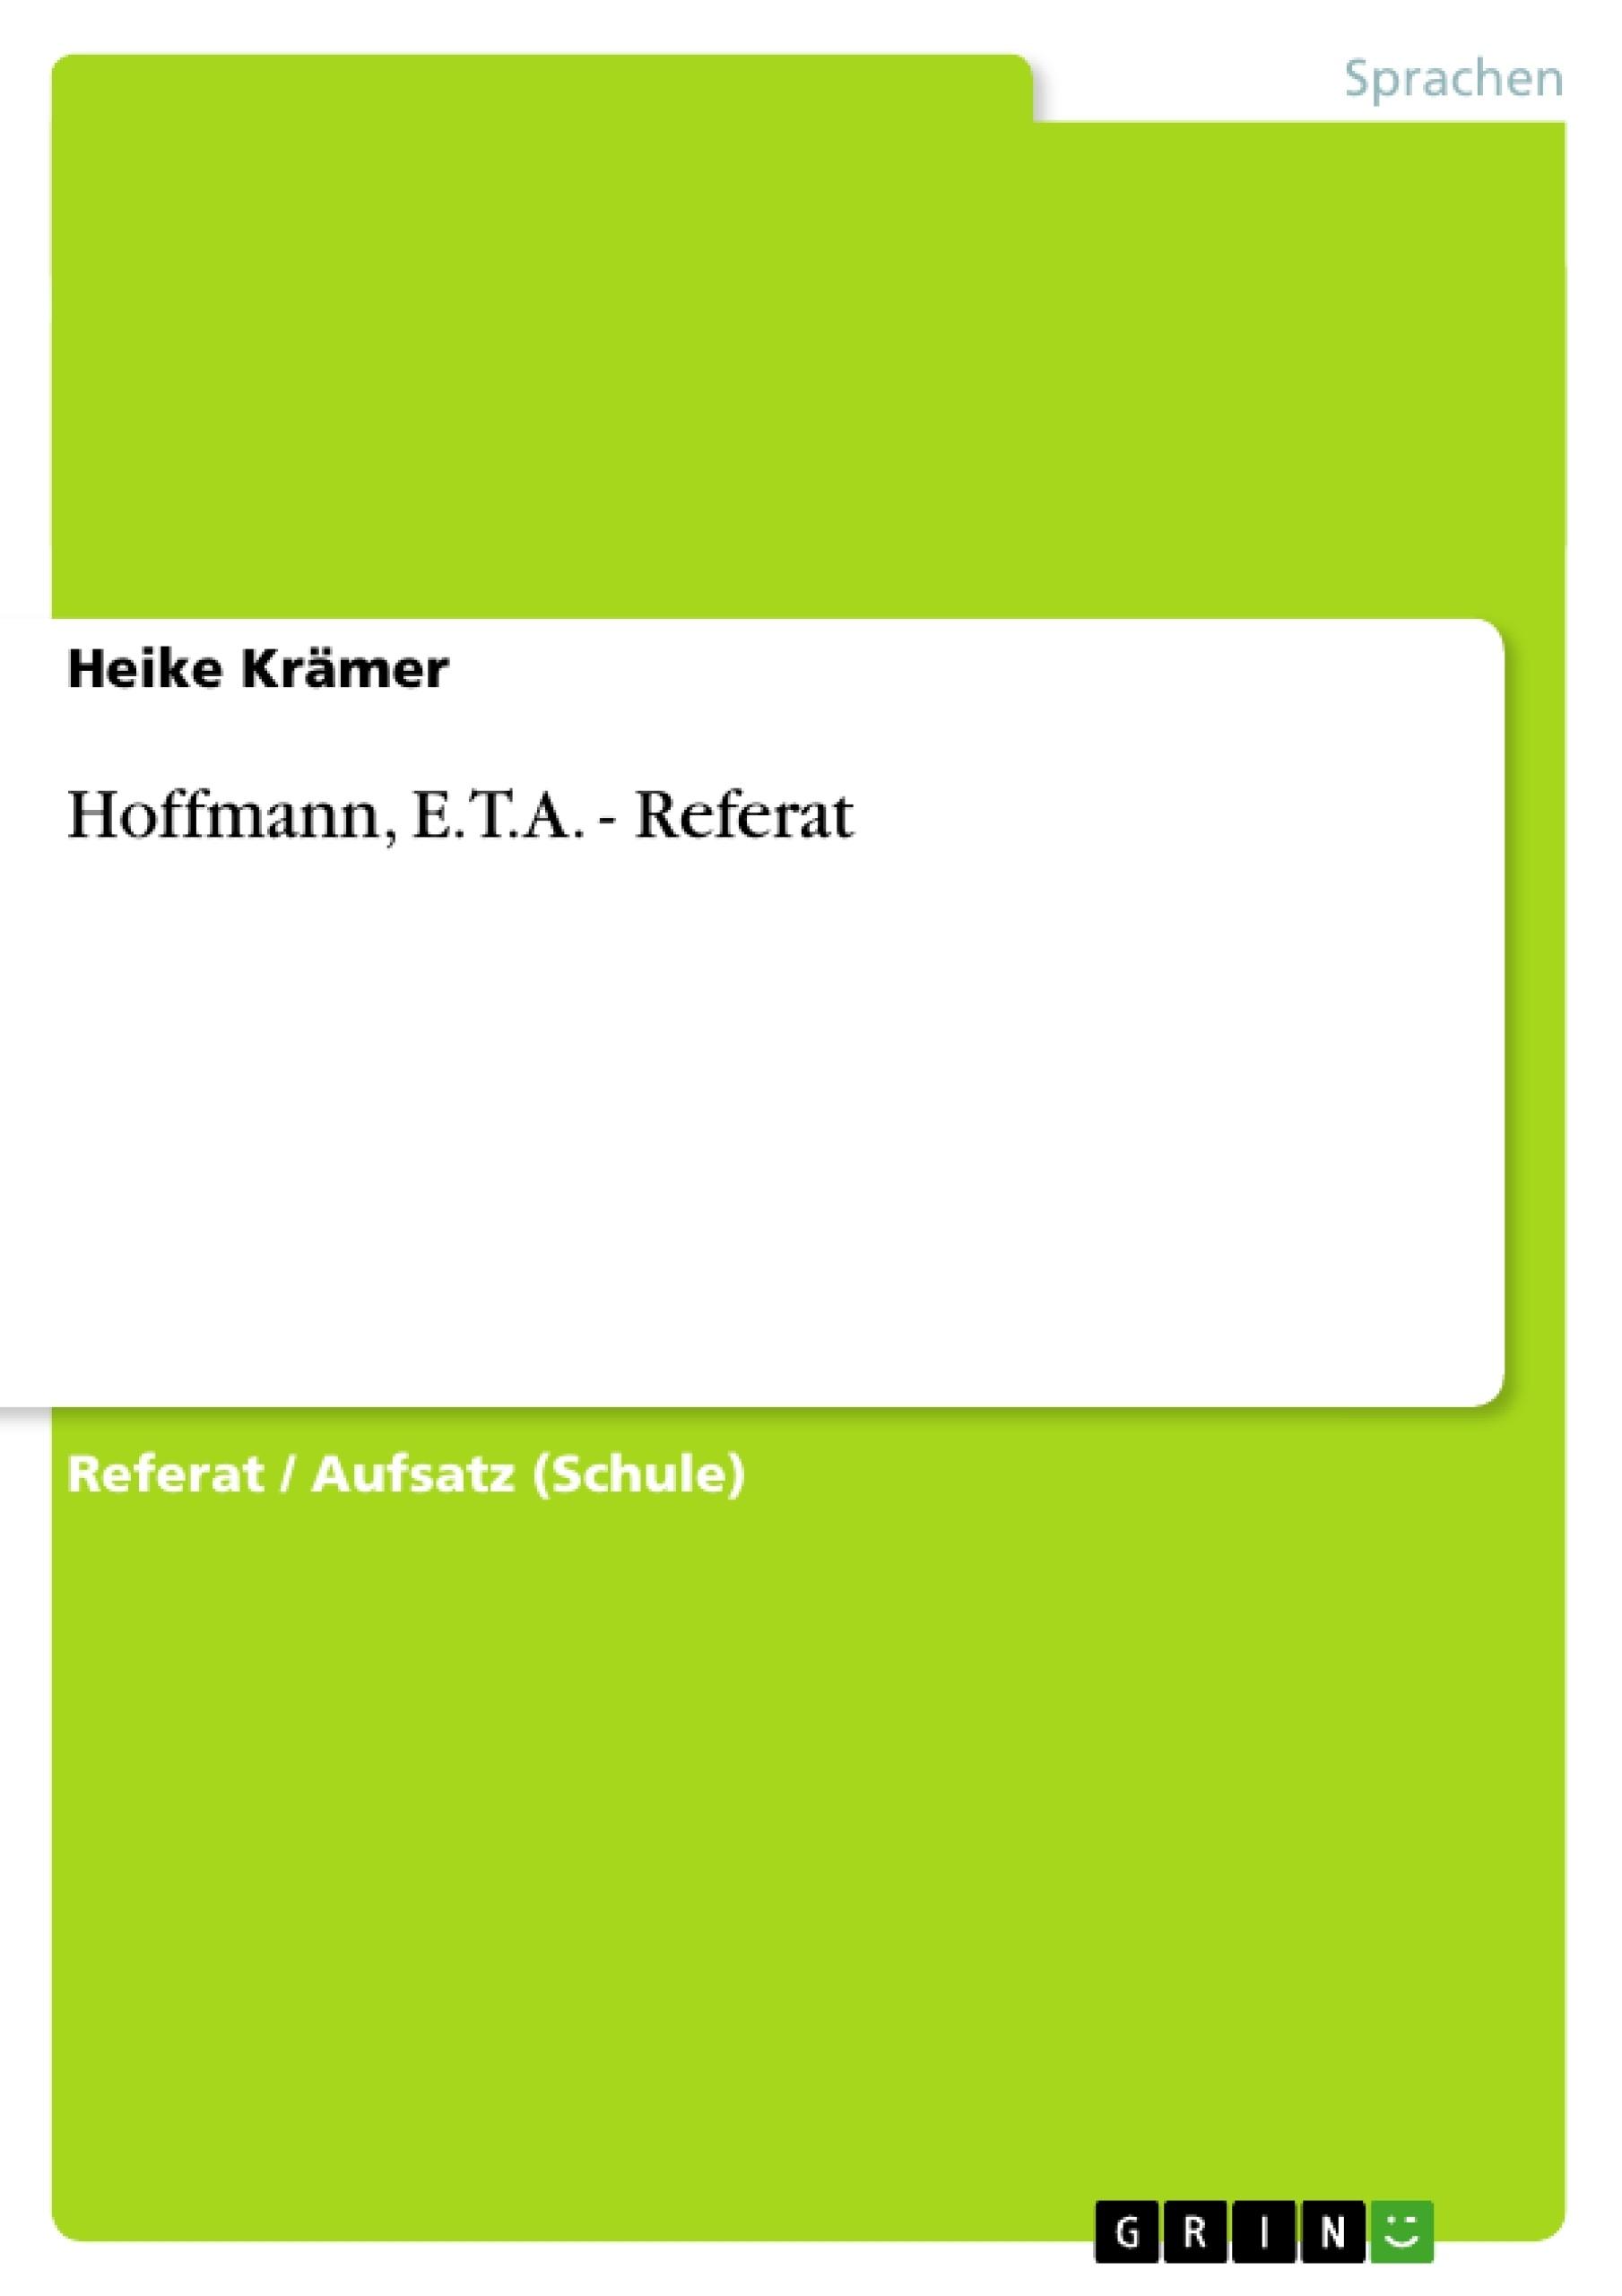 Titel: Hoffmann, E.T.A.  - Referat